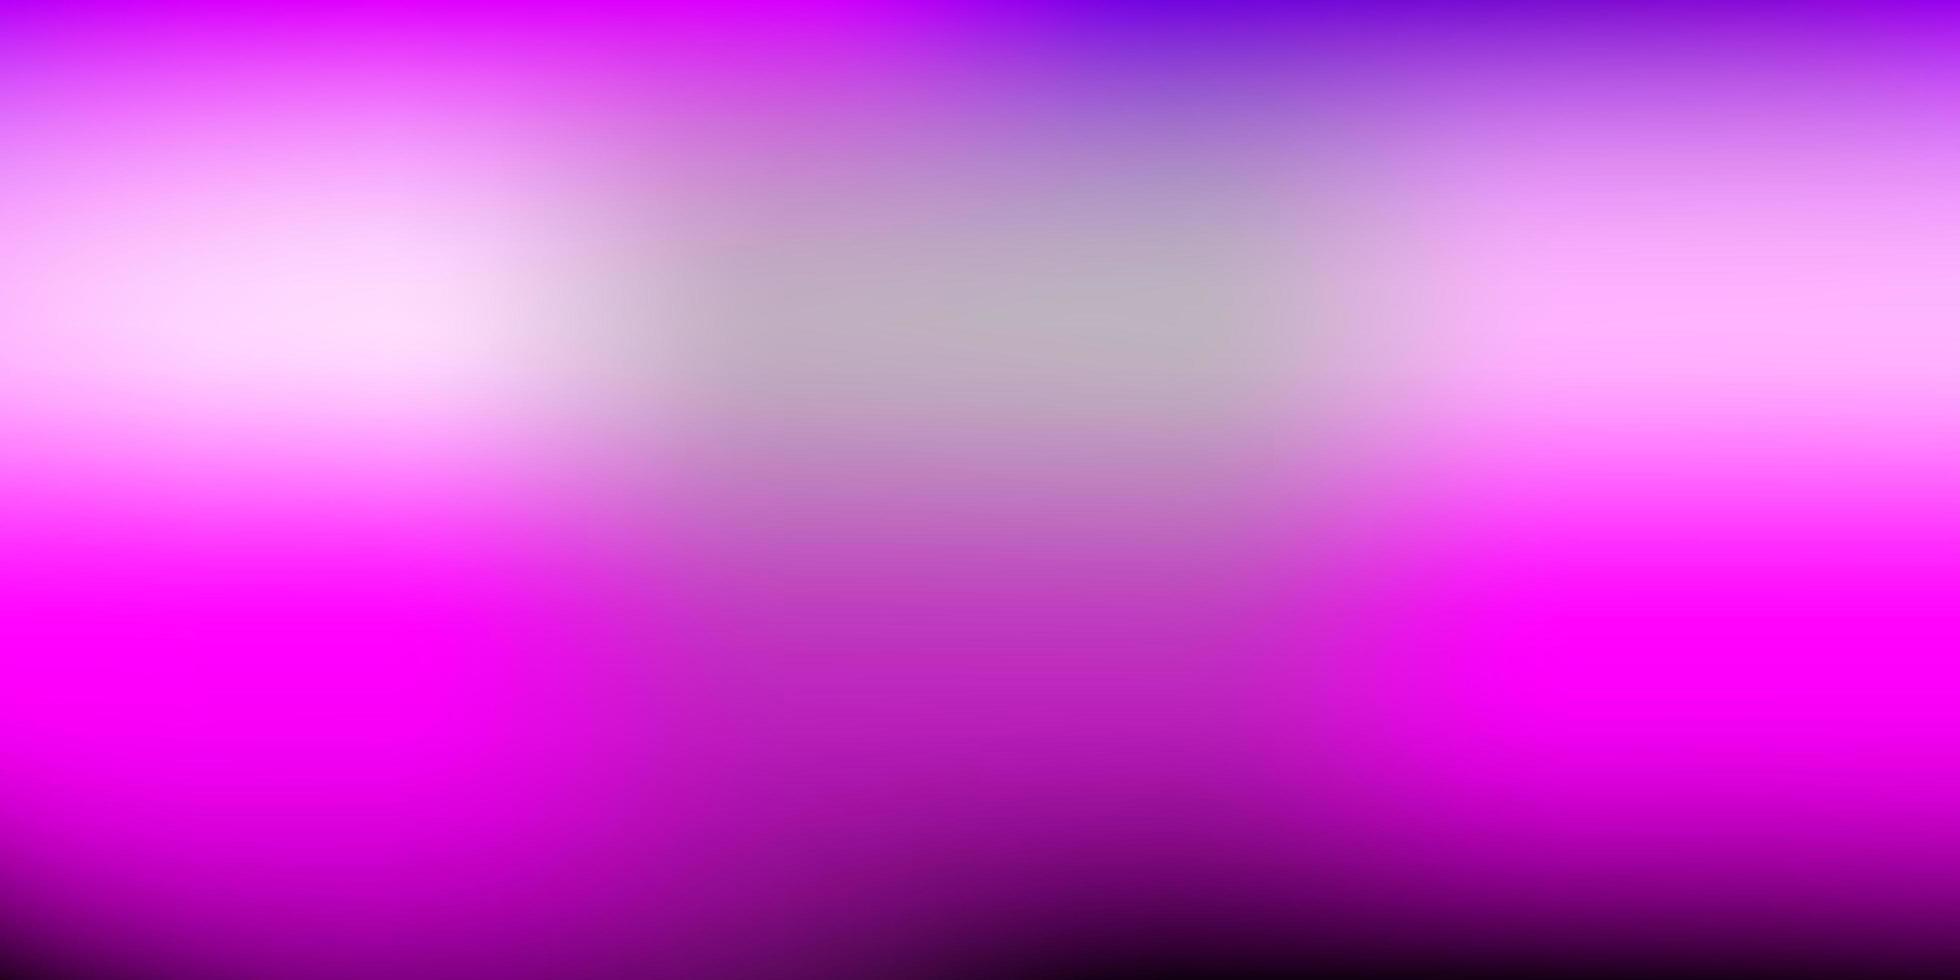 luz roxa, rosa vetor turva padrão.